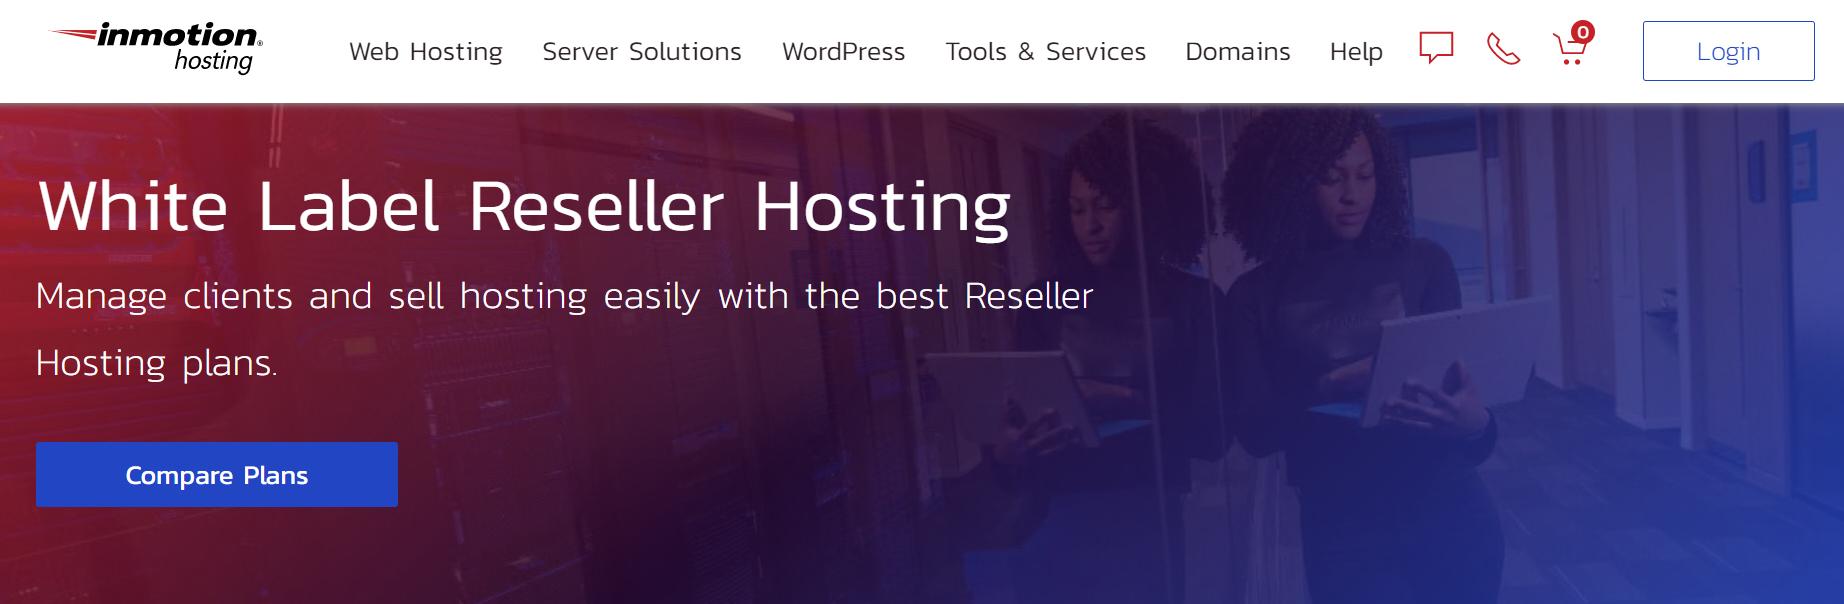 InMotion Hosting's hosting reseller page.